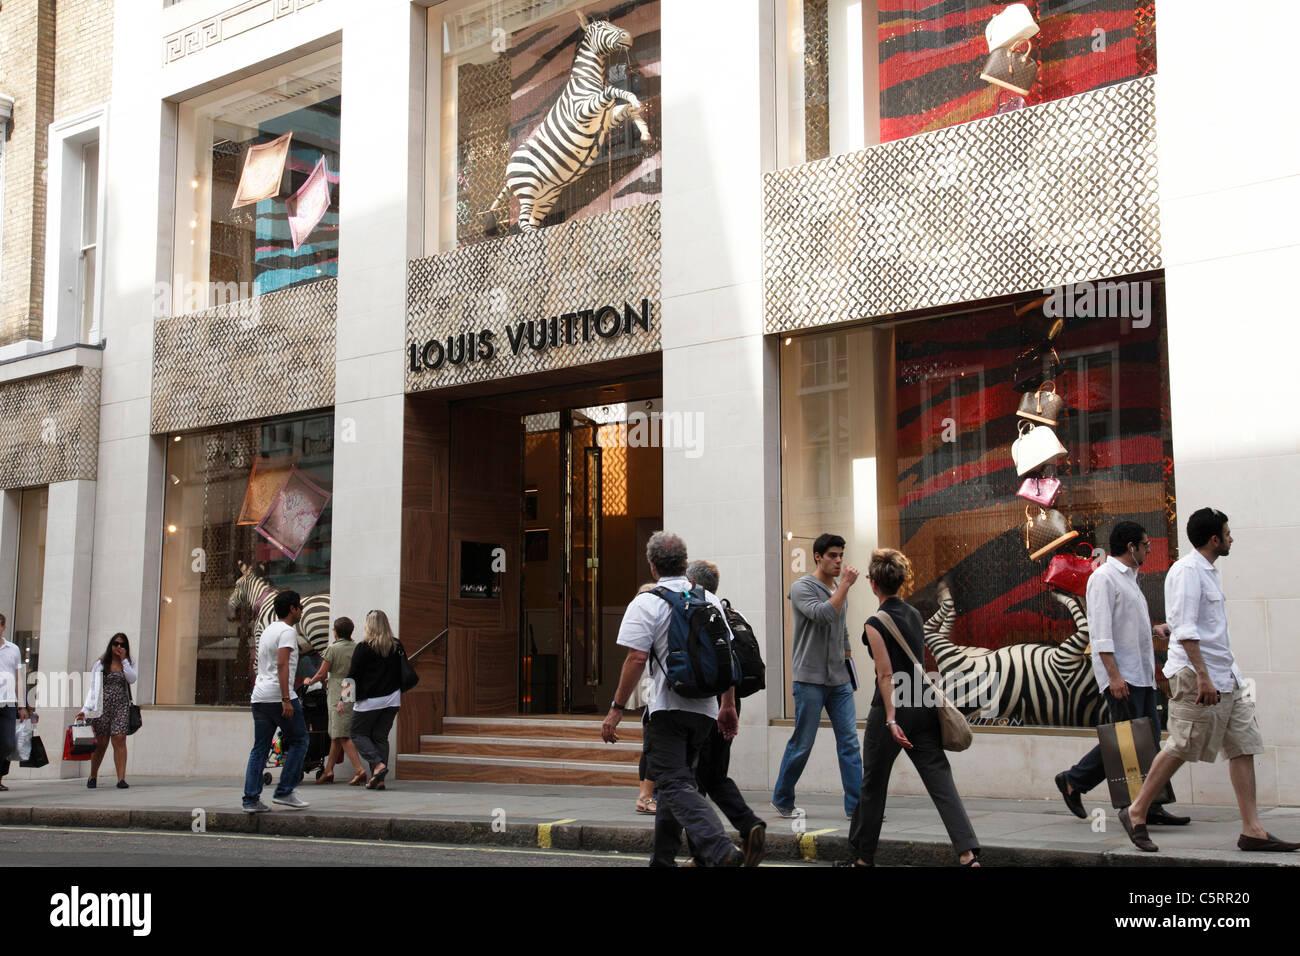 A Louis Vuitton store on New Bond Street, London, England ...